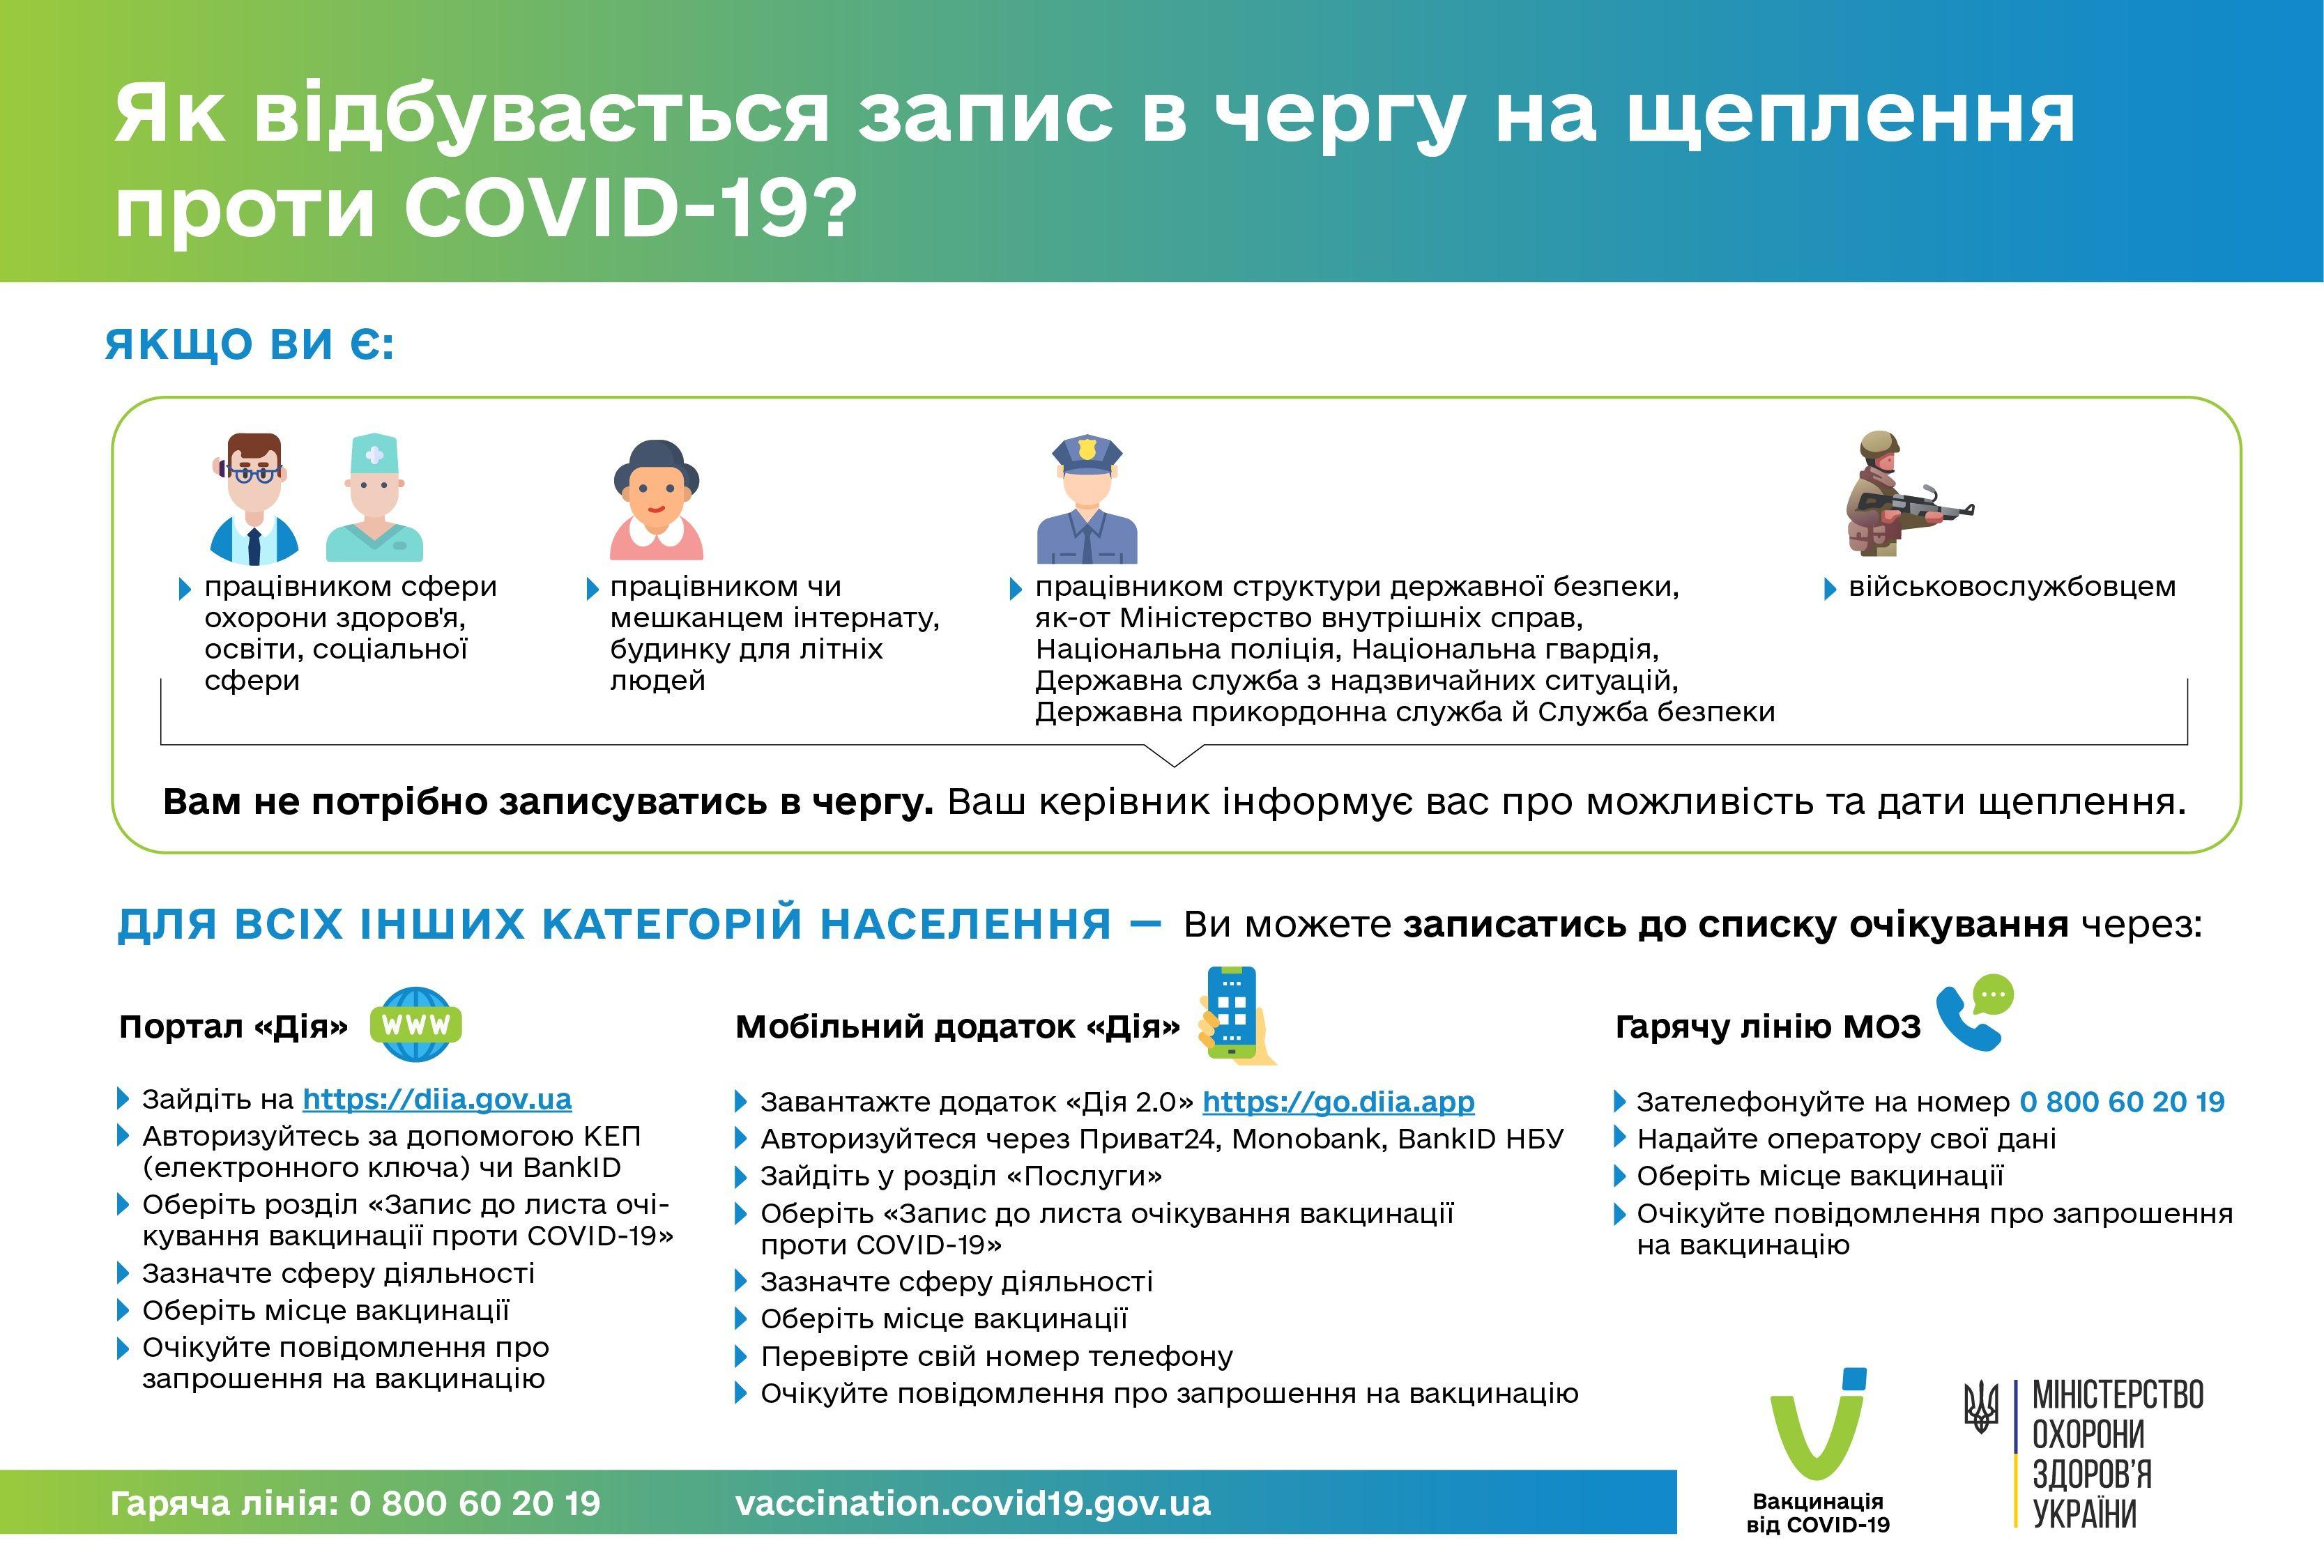 інструкція запису на вакцинацію